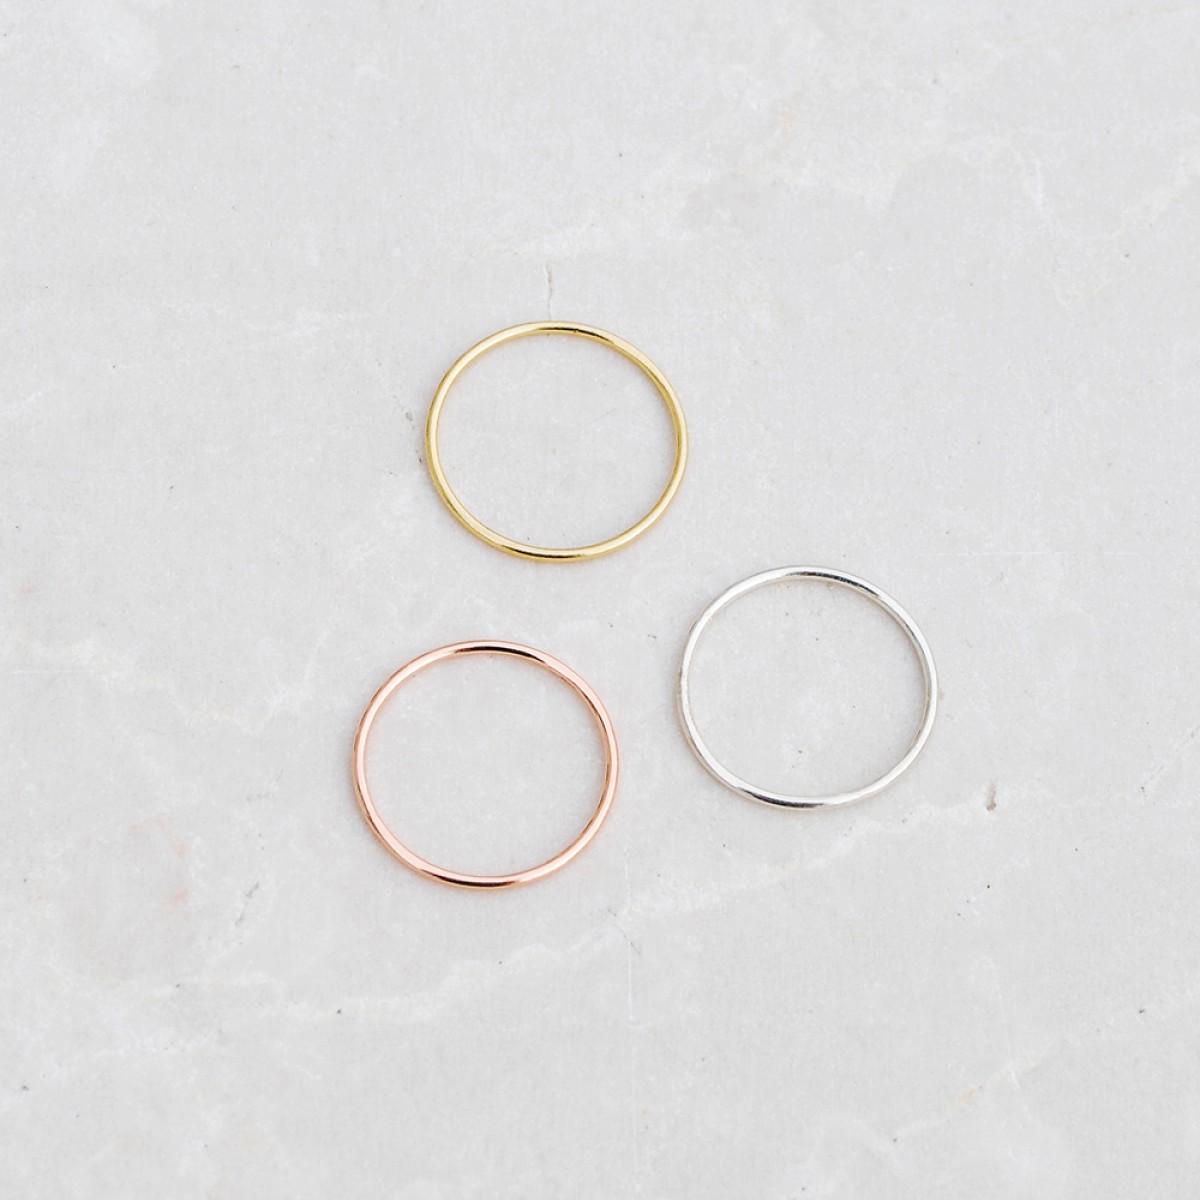 iloveblossom SIMPLE THINGS RING // silver